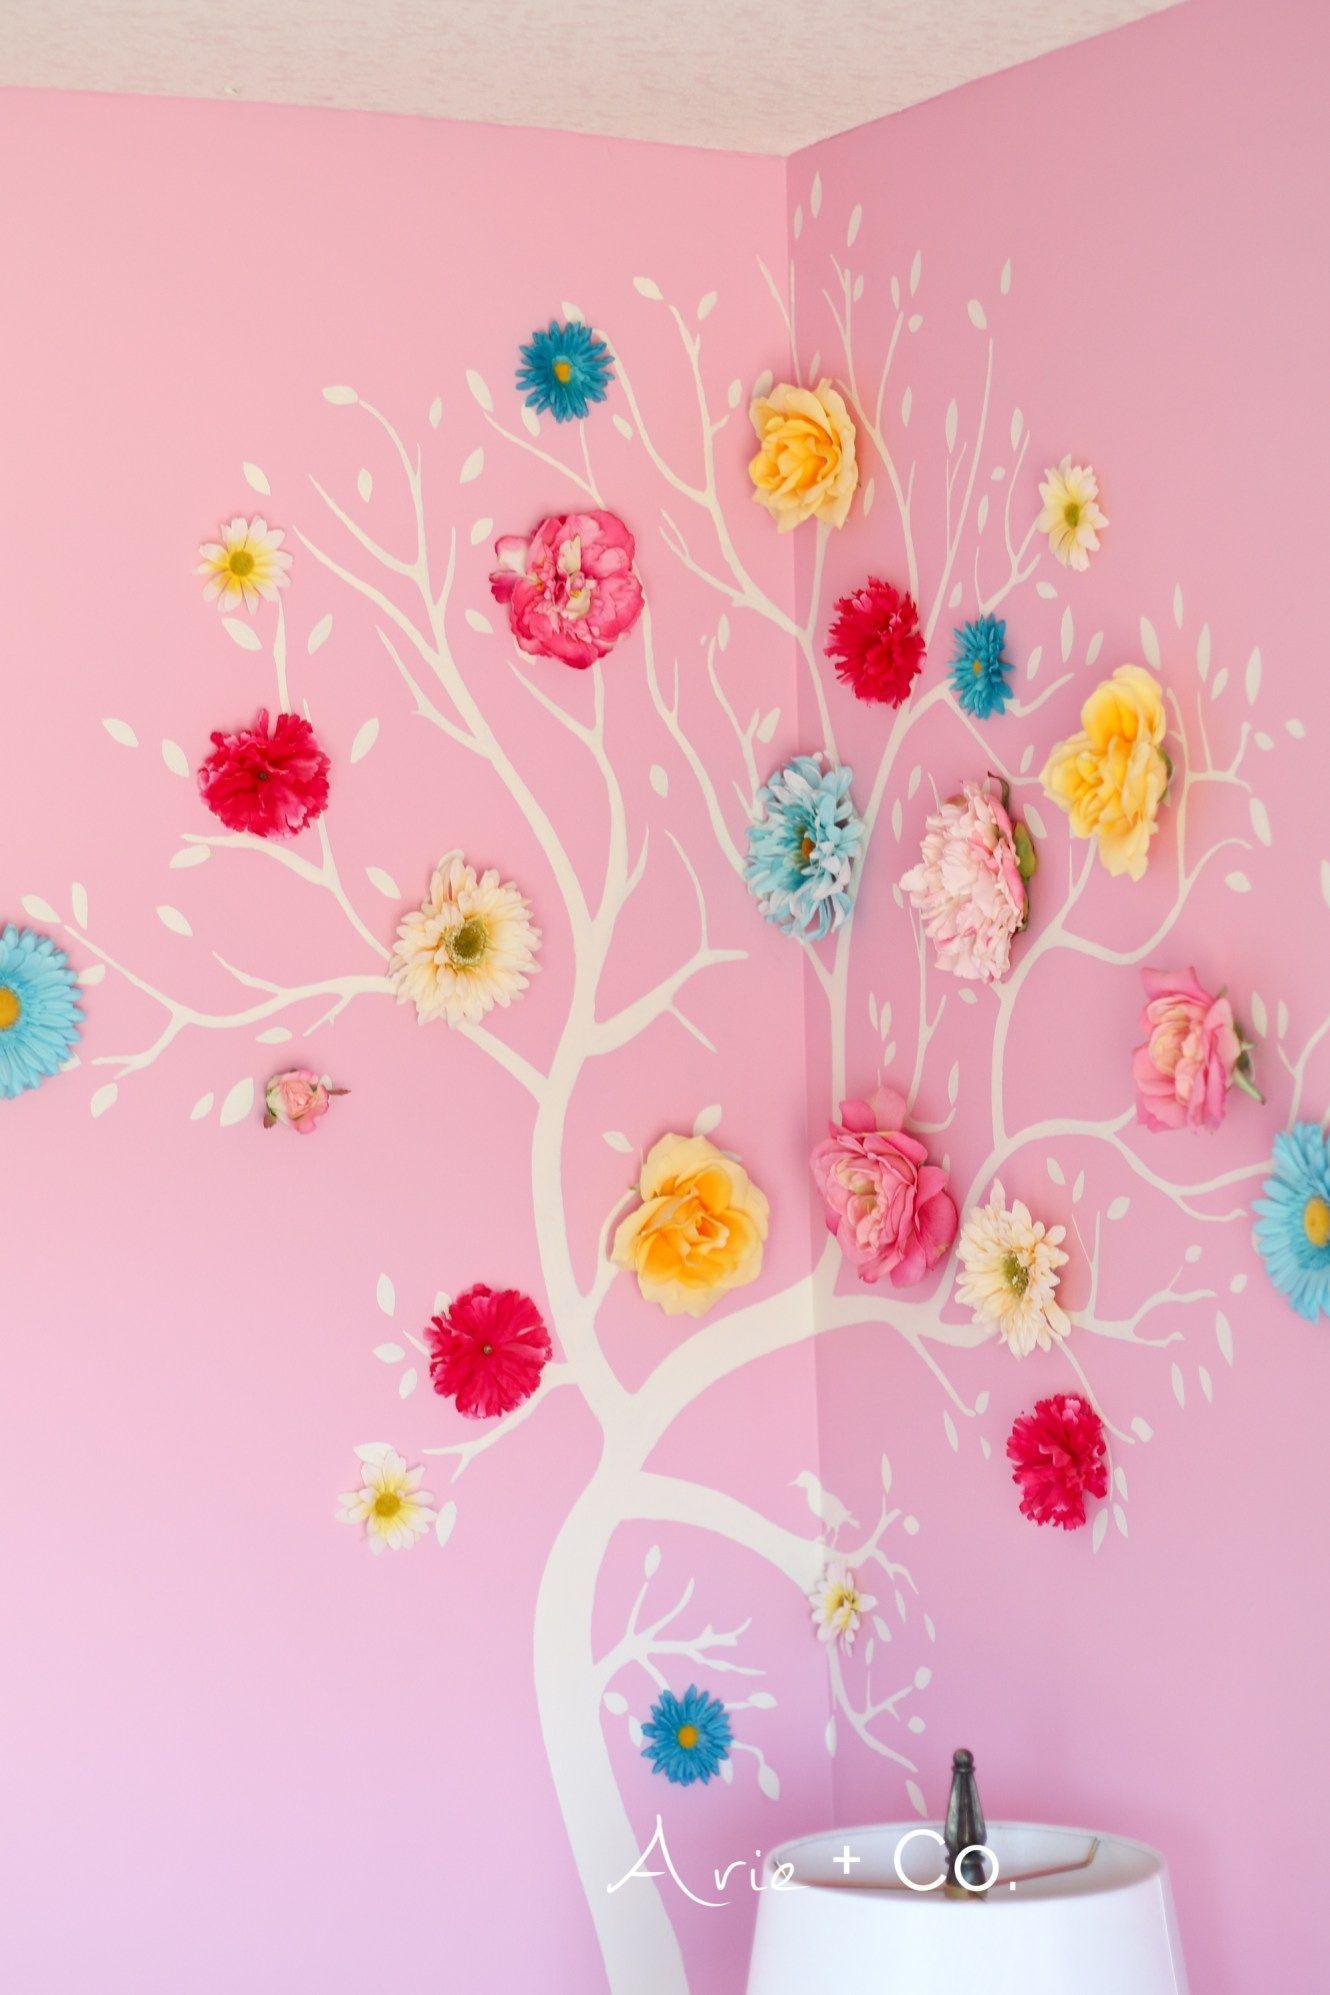 Flower Tree Wall Art Colorful Little Girl Room Girls Bedroom Ideas Benjamin Moore Pink Begonia Wall Girls Room Paint Girl Bedroom Walls Shared Girls Bedroom